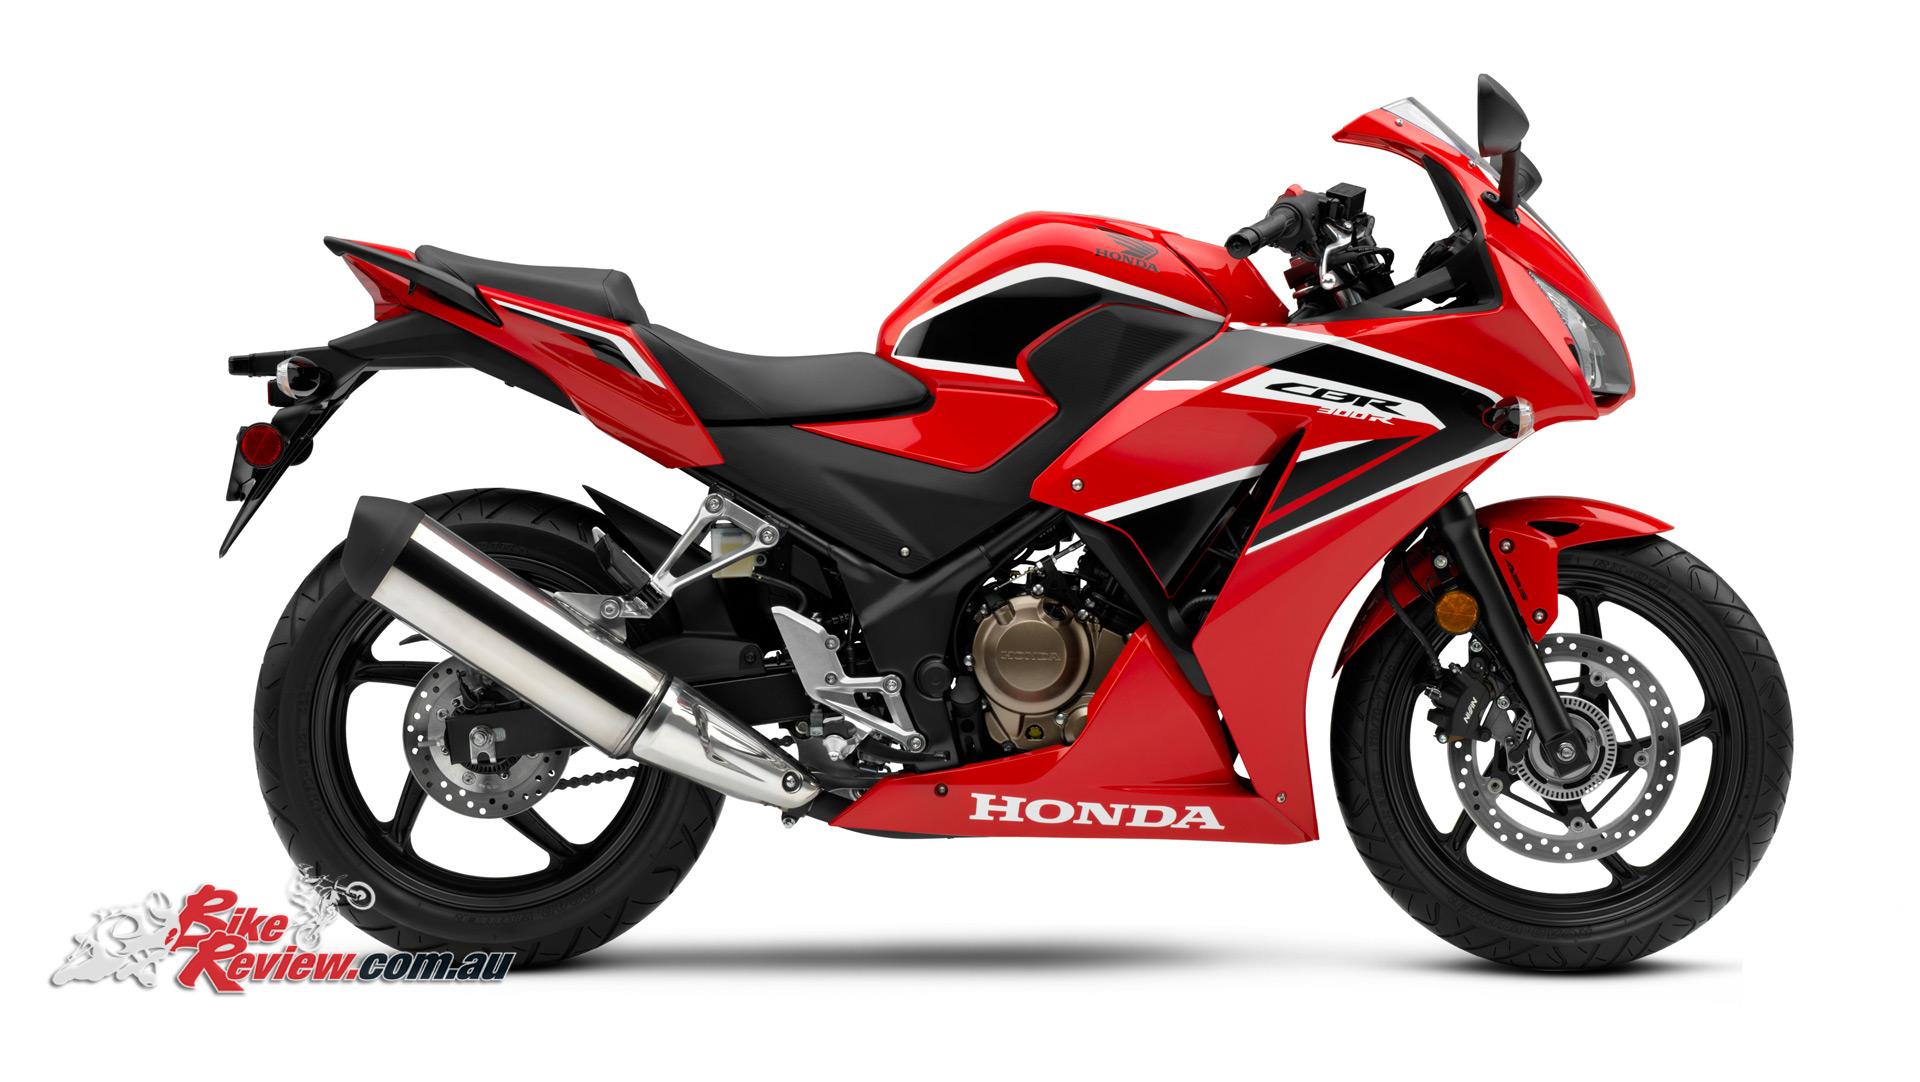 2017's Honda 300s arrive - CBR300R, CB300F - Bike Review